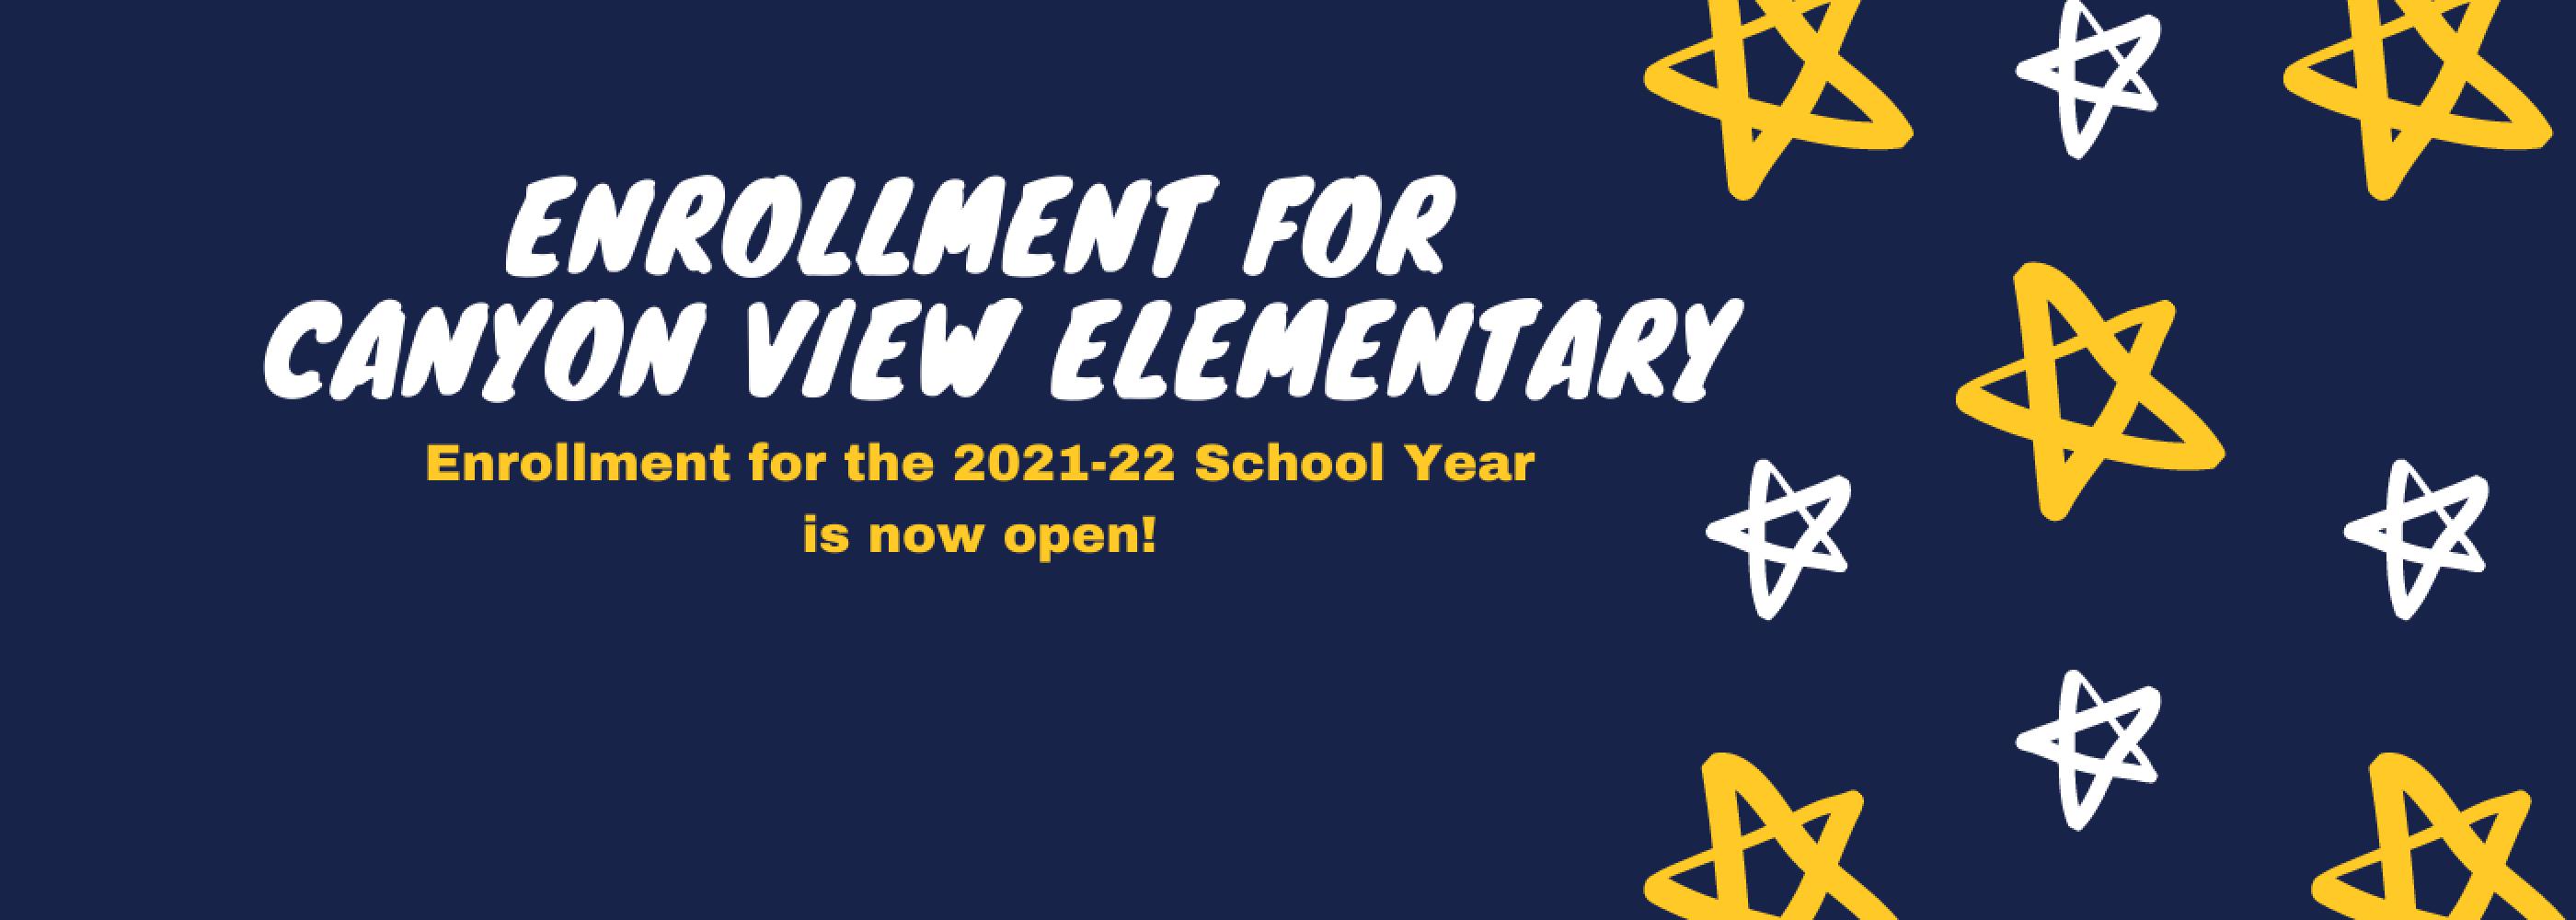 enrollment banner